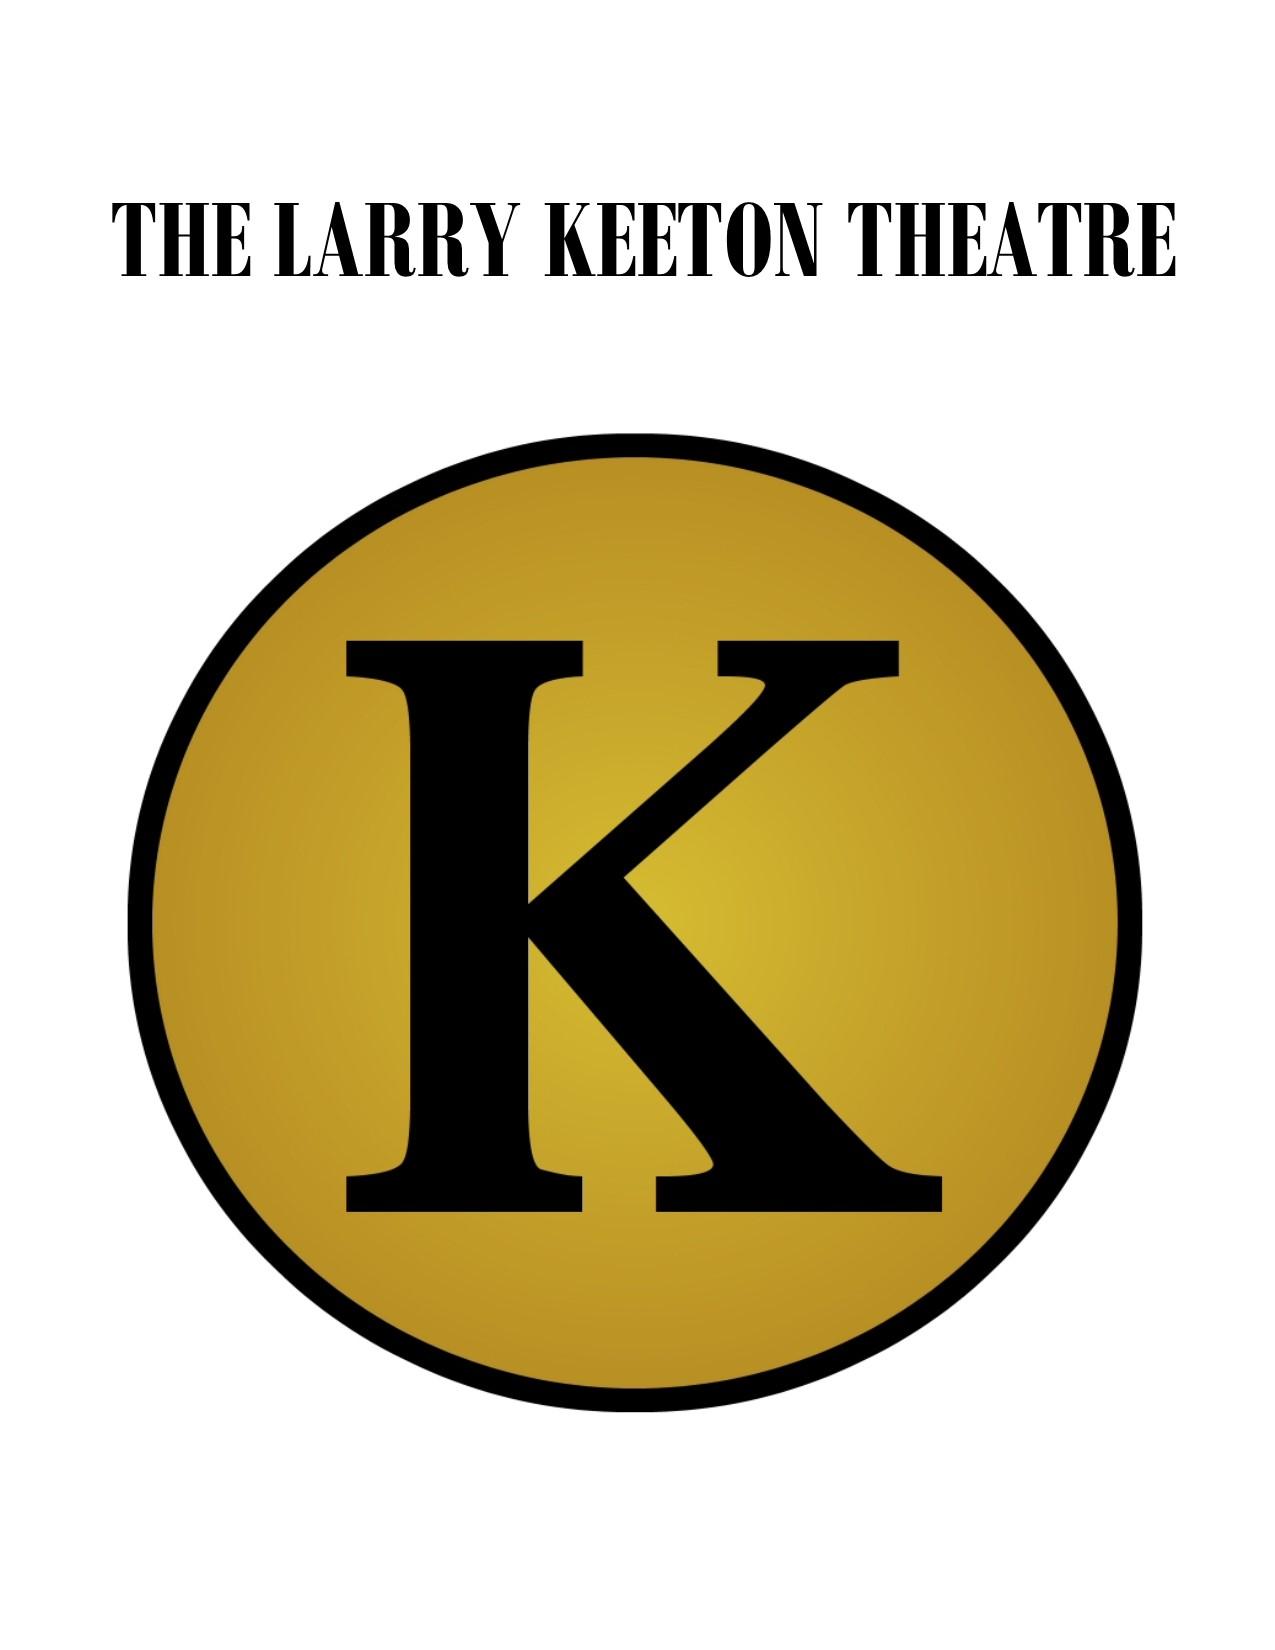 LARRY KEETON THEATRE